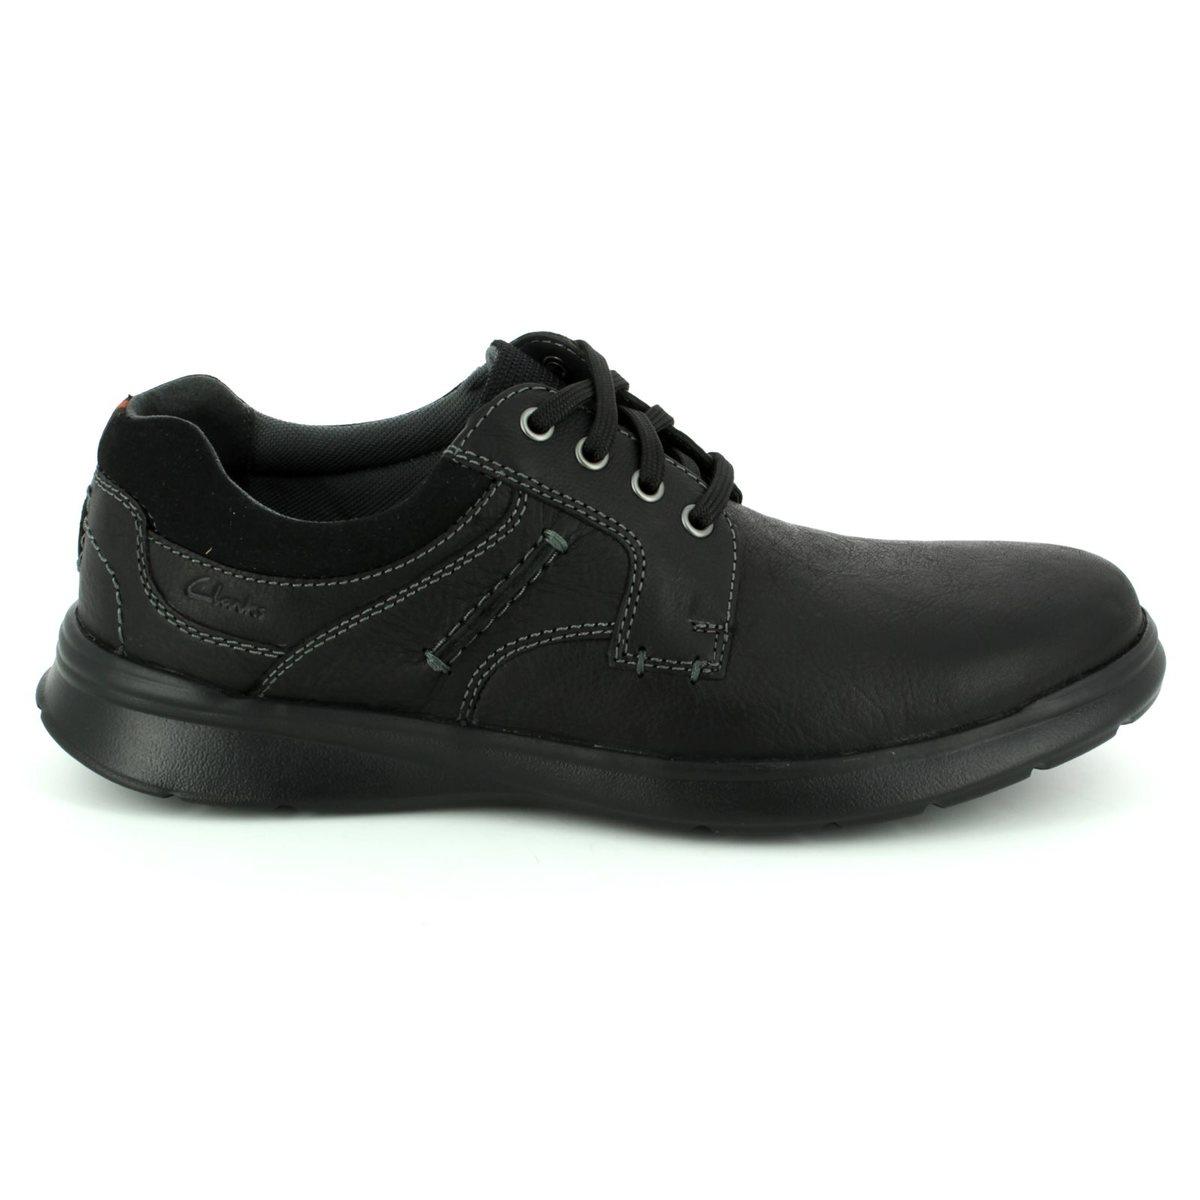 Pram Shoes White